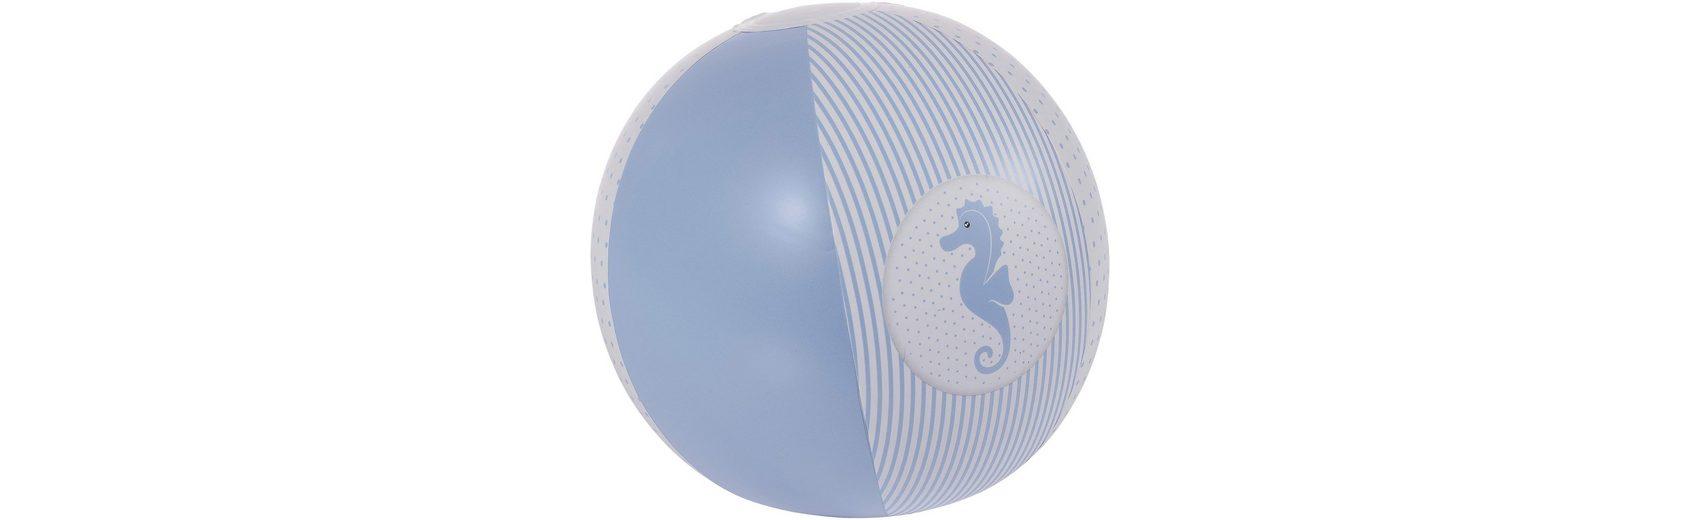 Royalbeach Strandball Robbini Boy